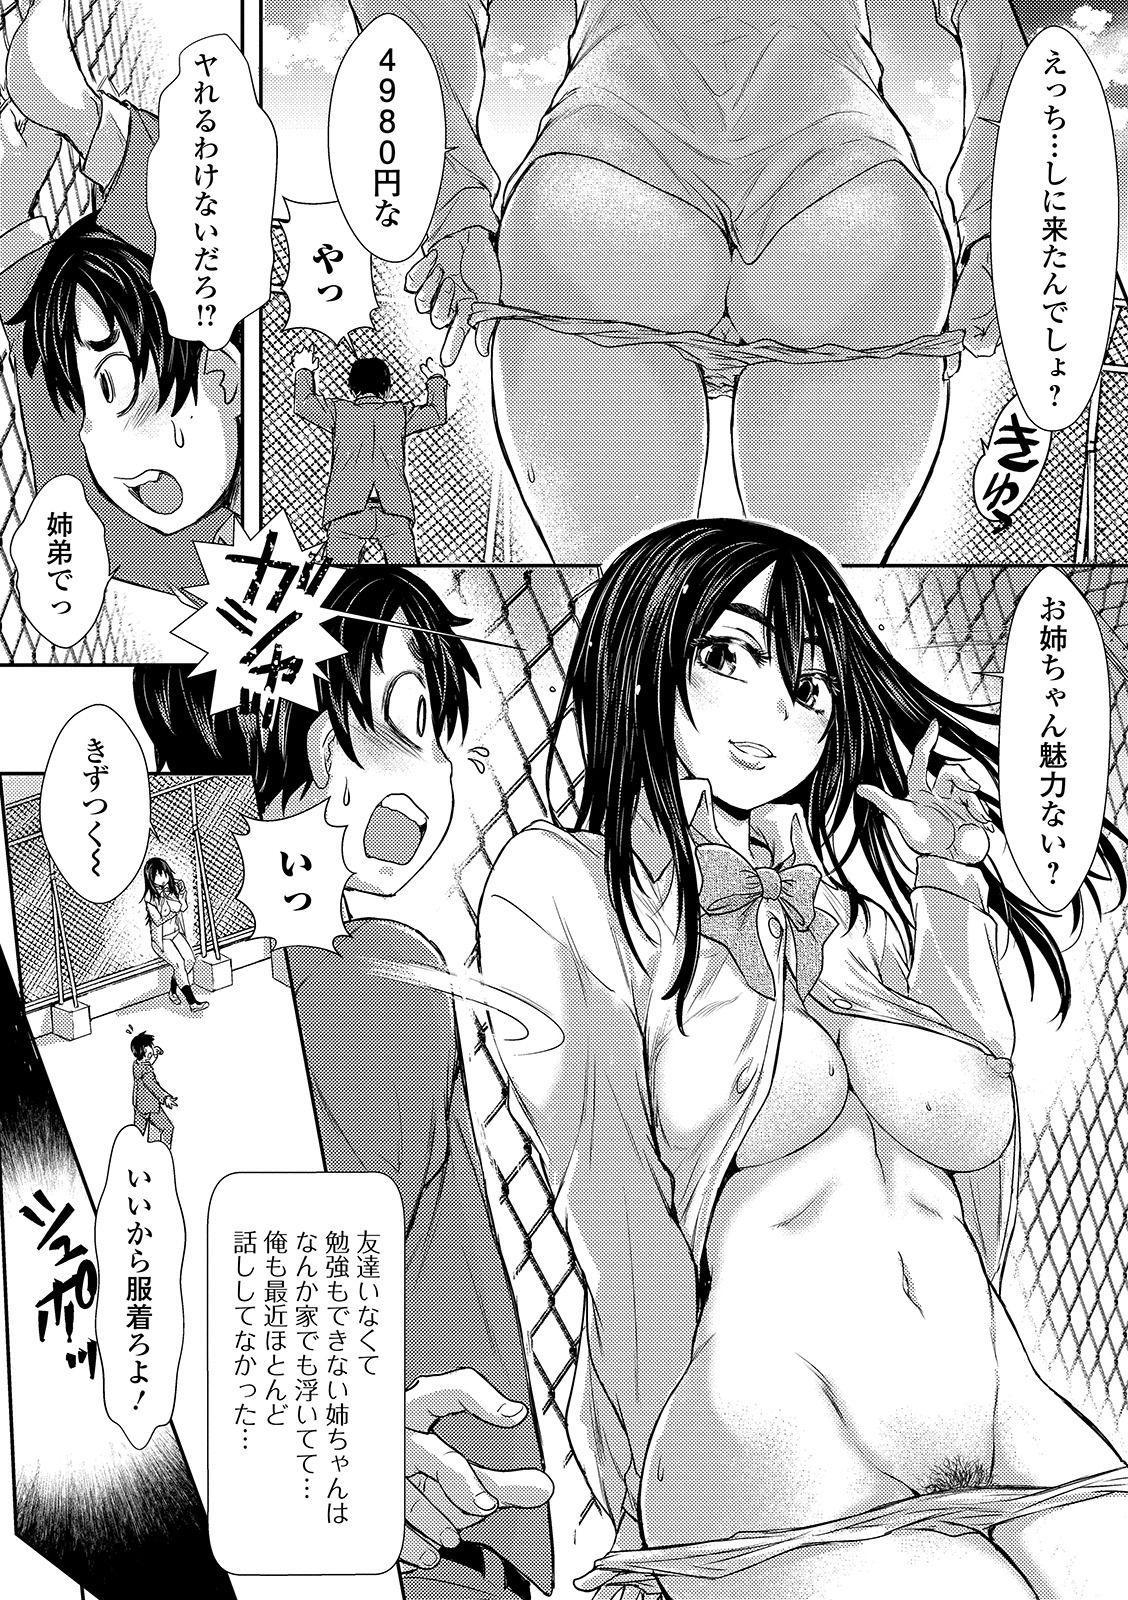 COMIC Shigekiteki SQUIRT!! Vol. 15 209